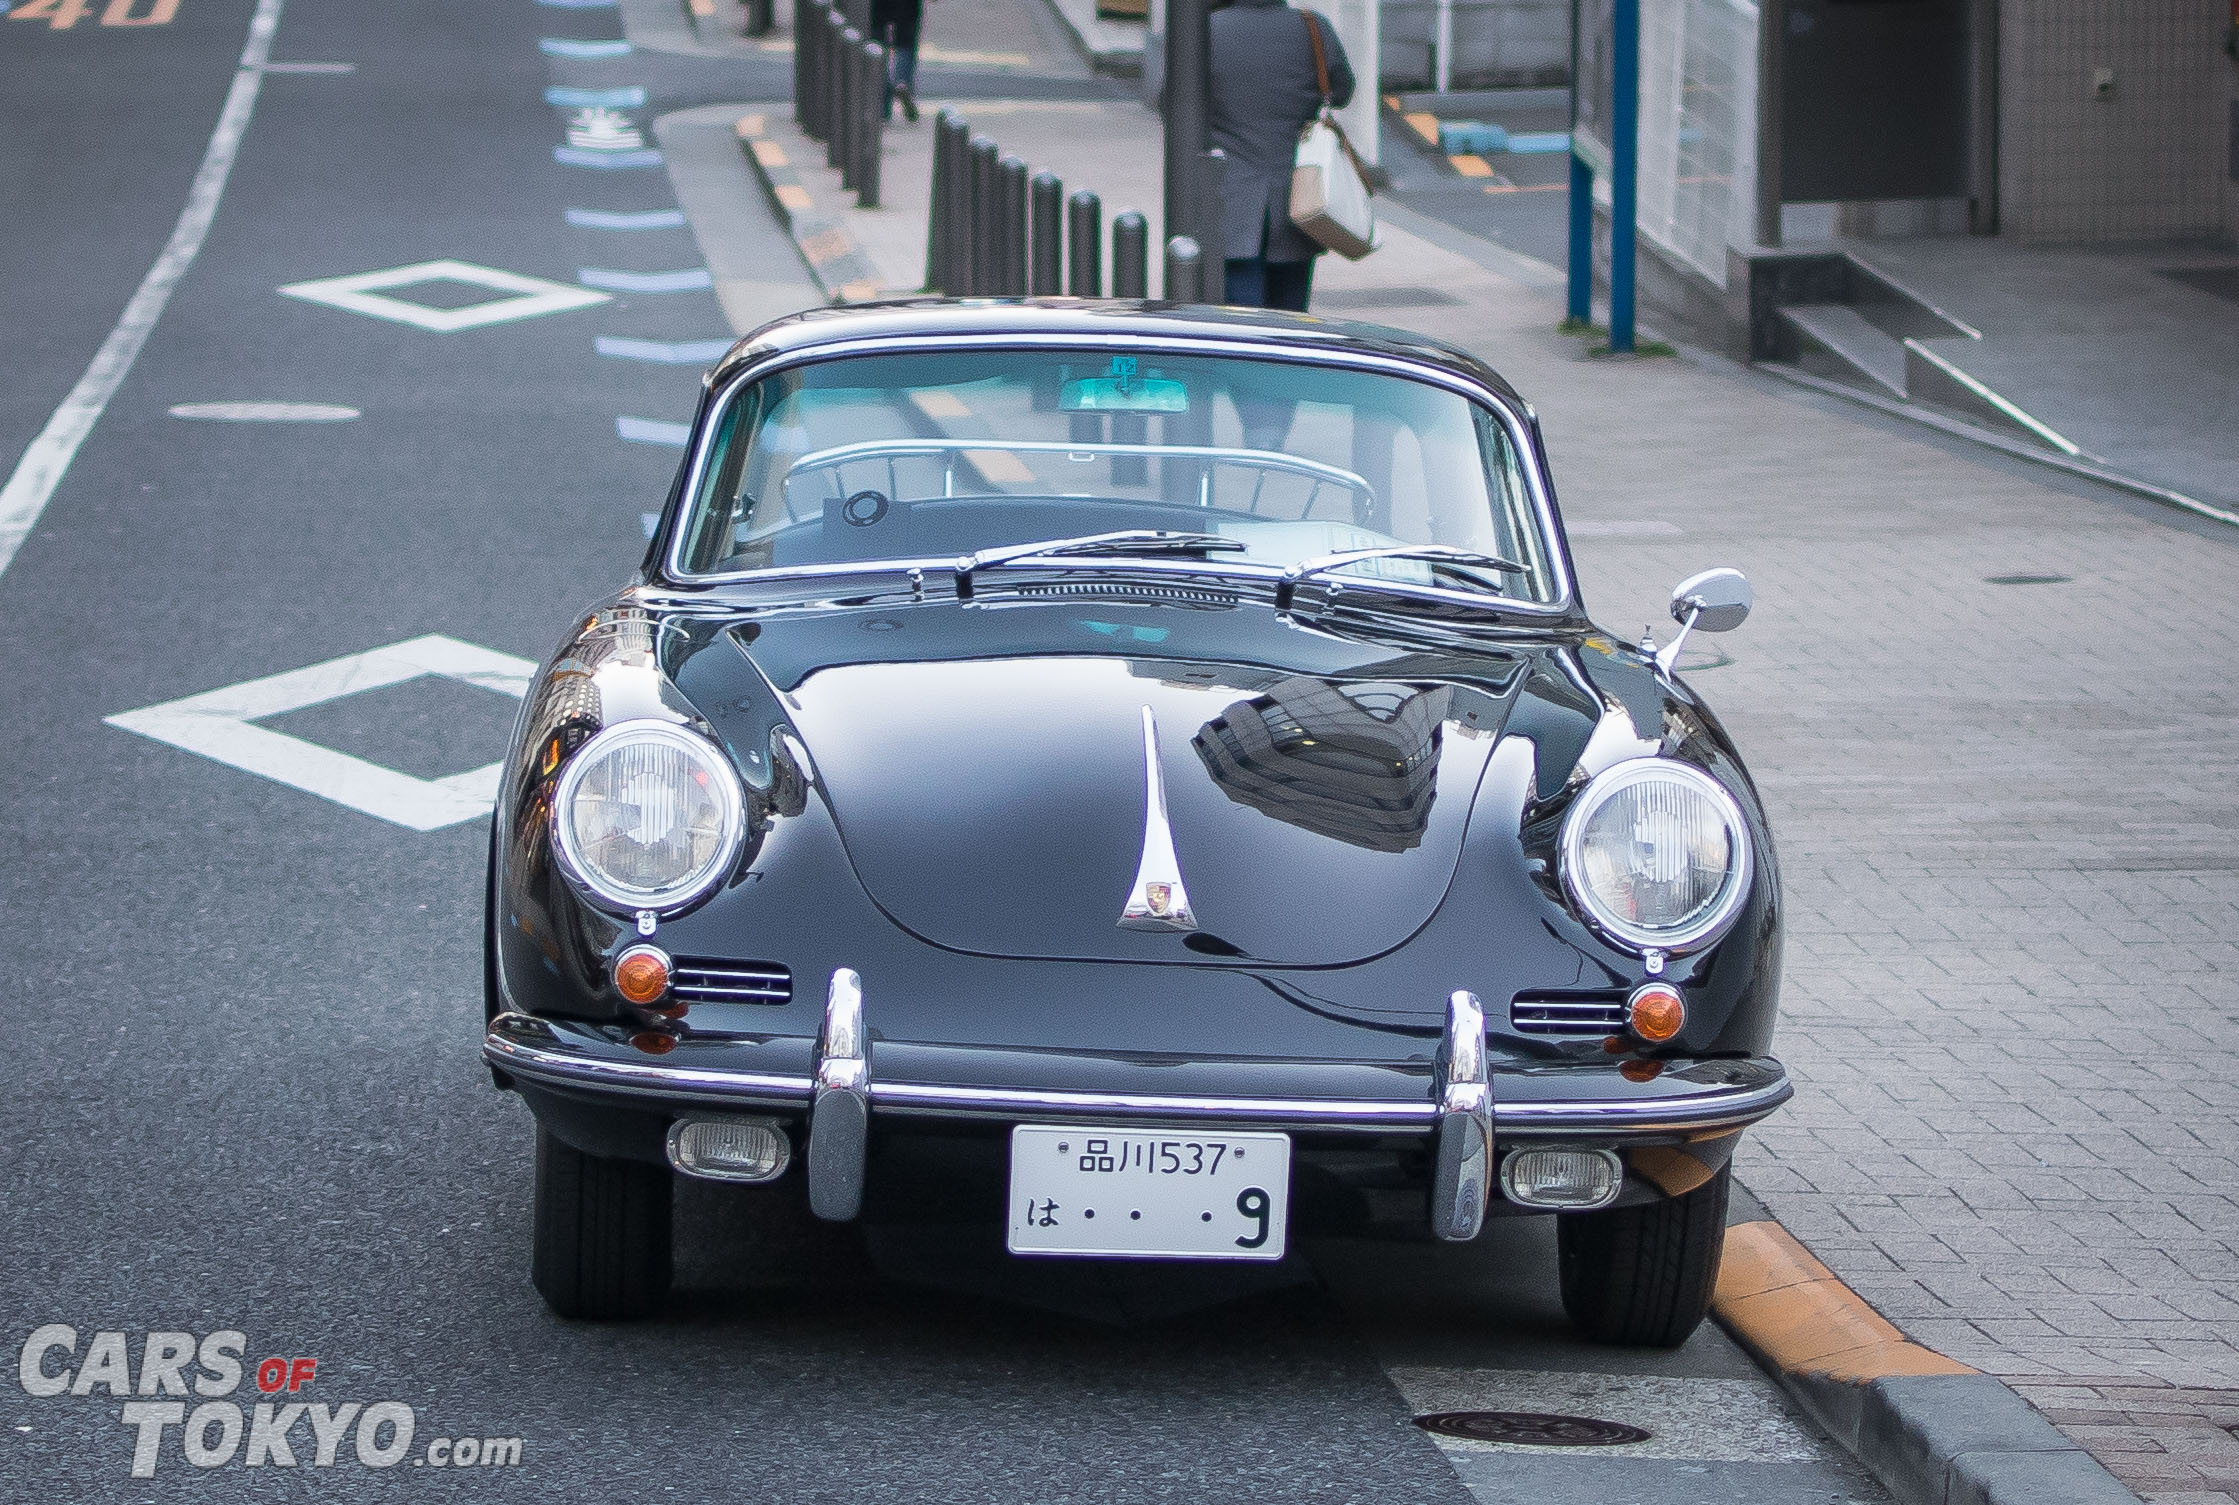 Cars of Tokyo Classic Porsche 356